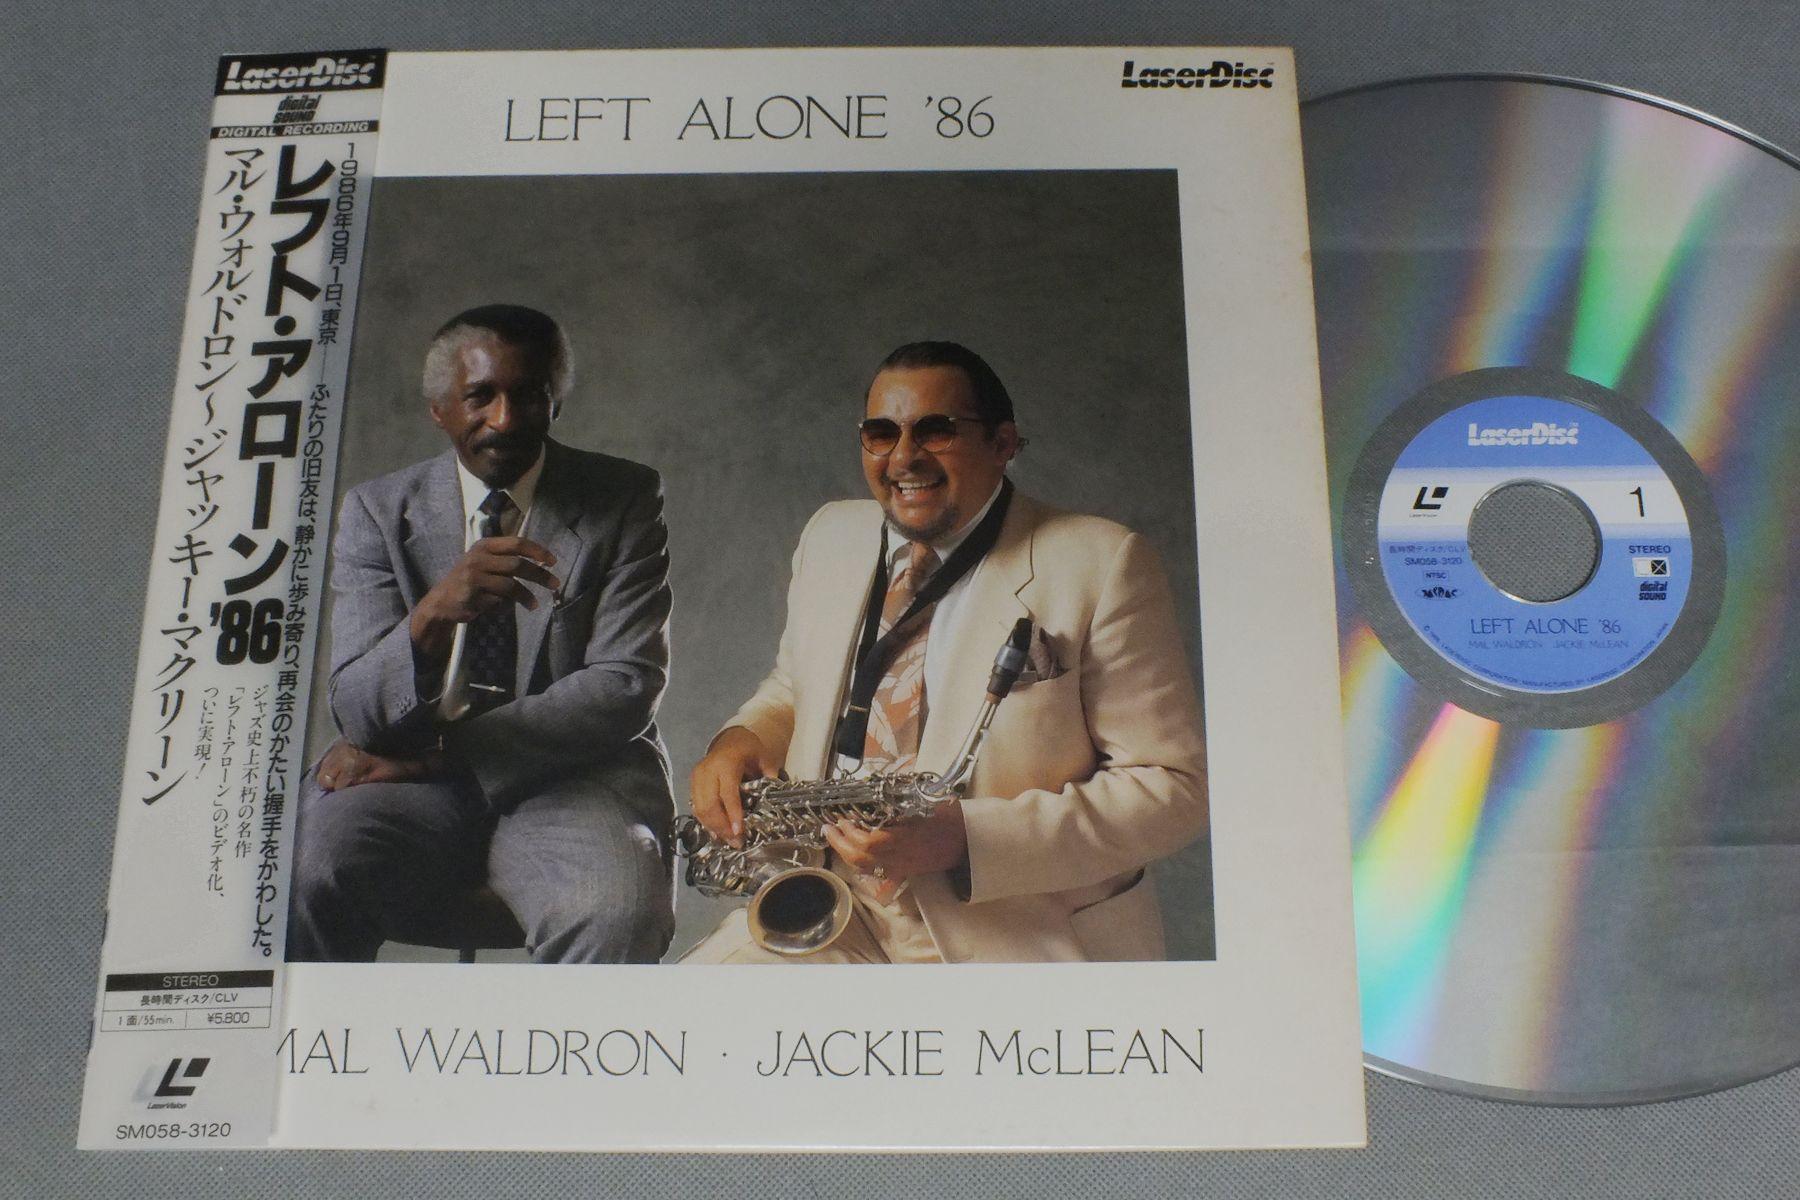 MAL WALDRON - LEFT ALONE`86 - Laser Disc